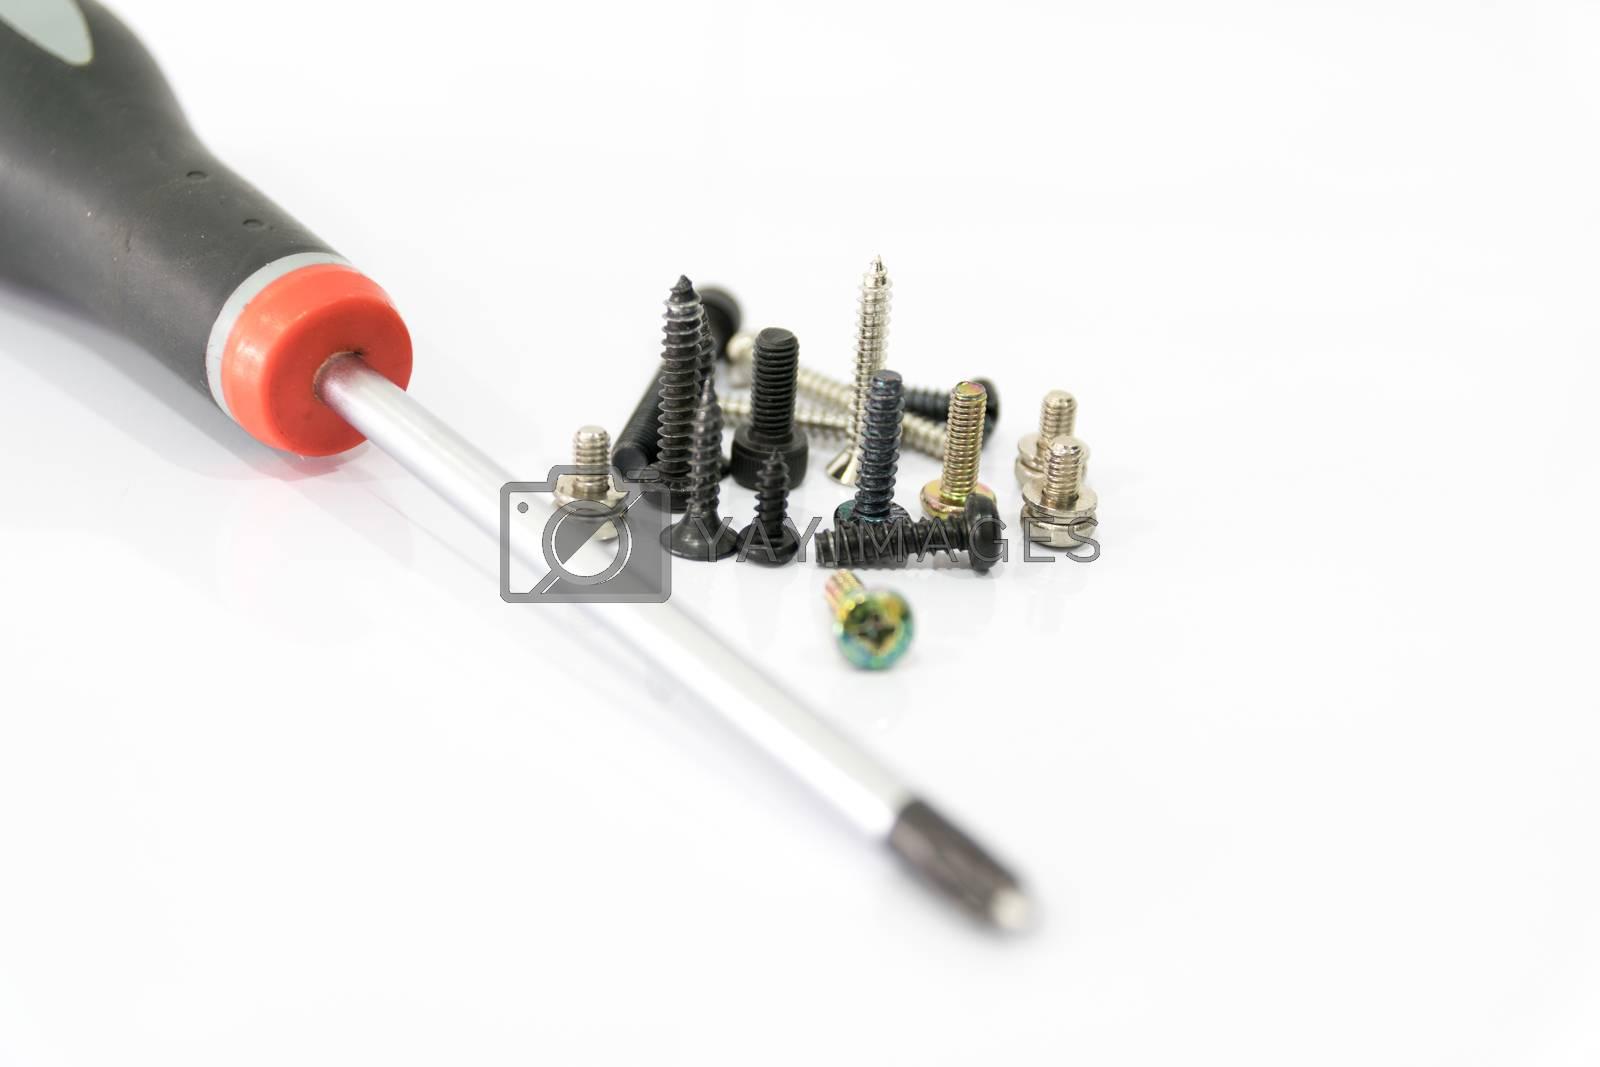 Machine screws and screws driver. by wattanaphob